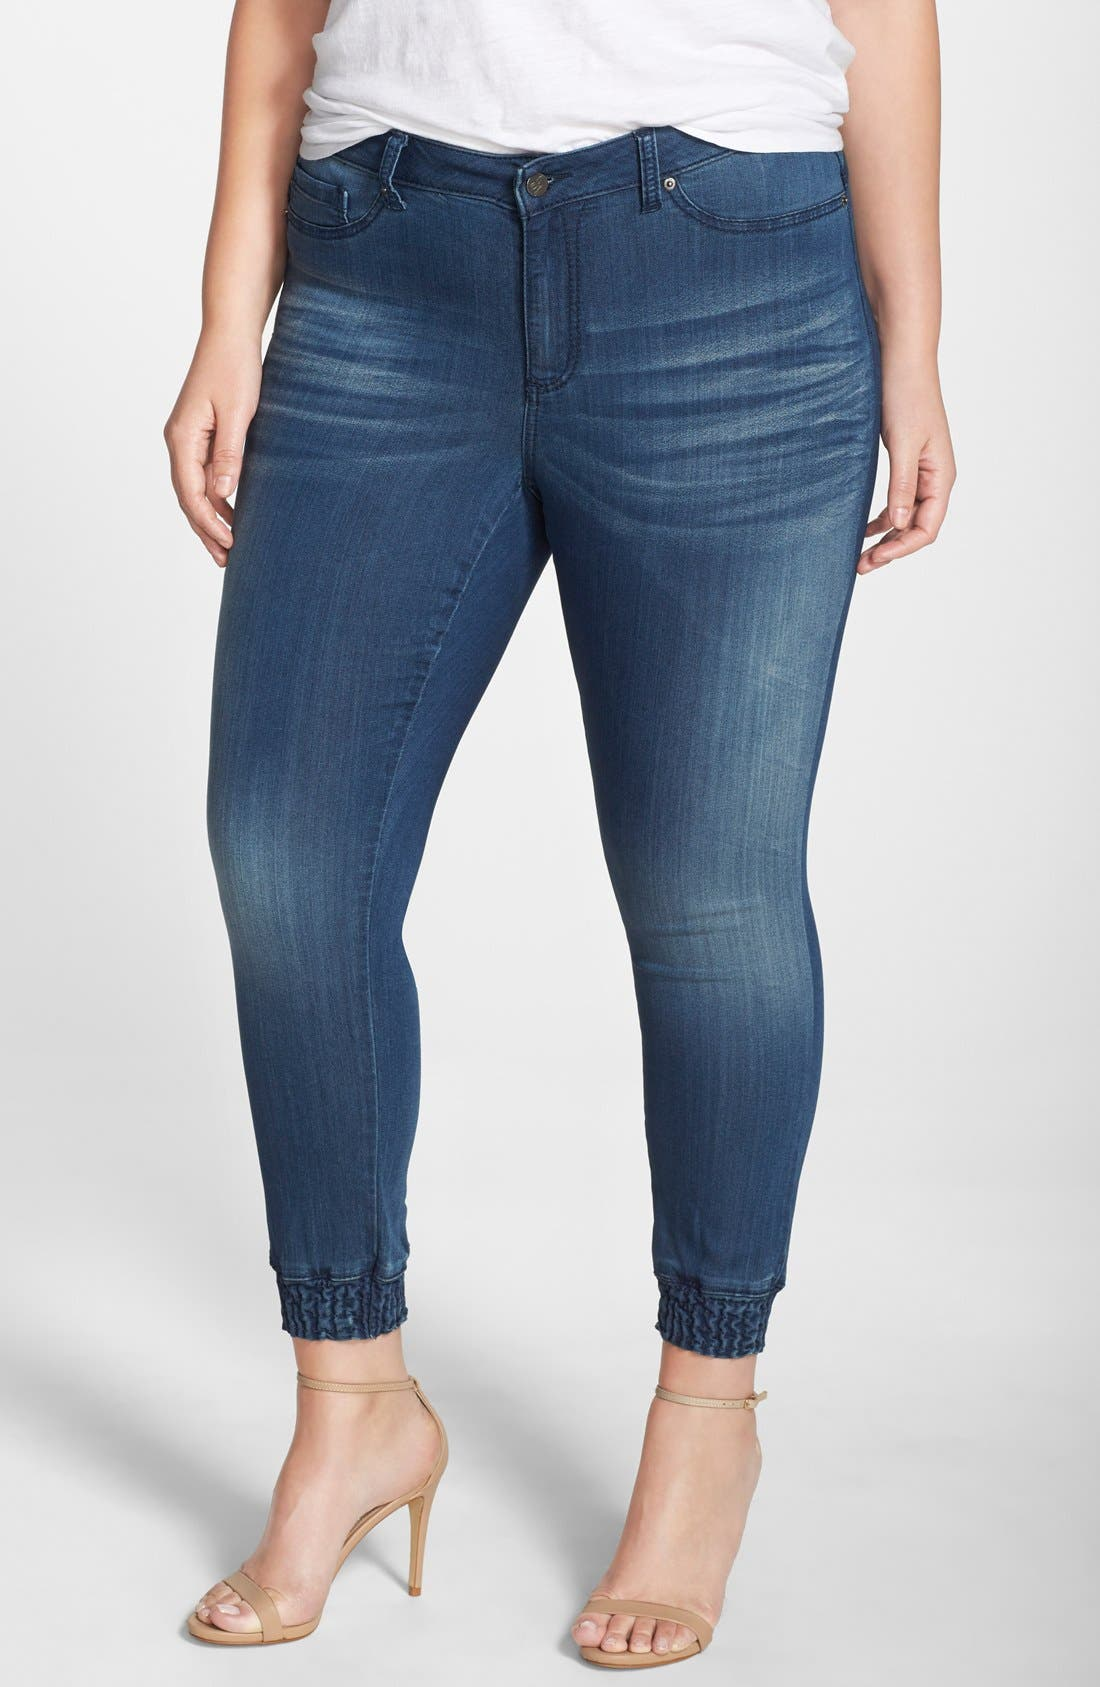 POETIC JUSTICE 'Suzzie' Stretch Knit Denim Crop Jeans